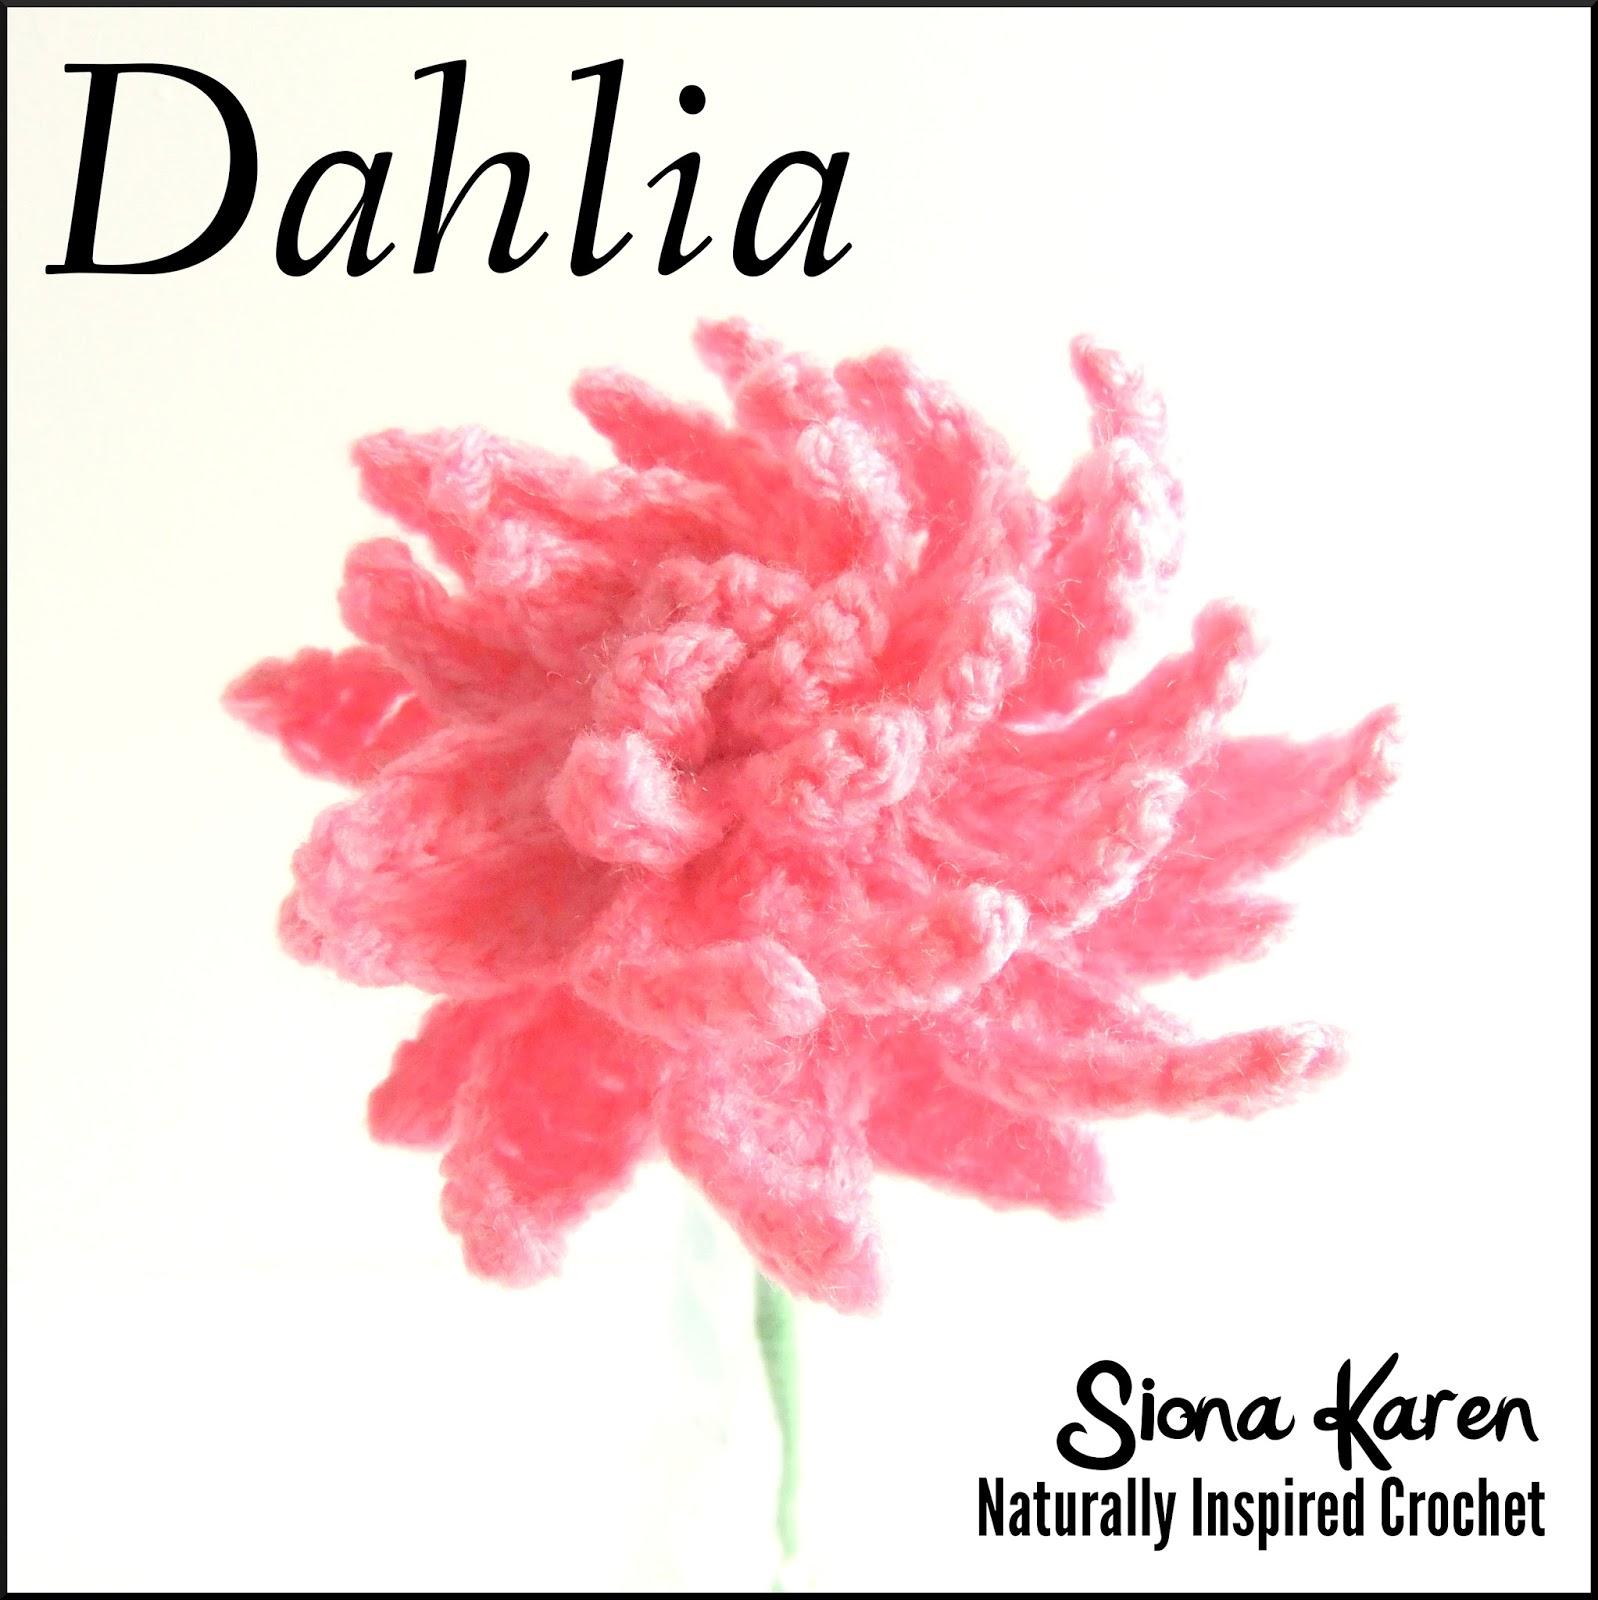 Crochet Flower Pattern Dahlia : Siona Karen : Crochet Pattern: Dahlia